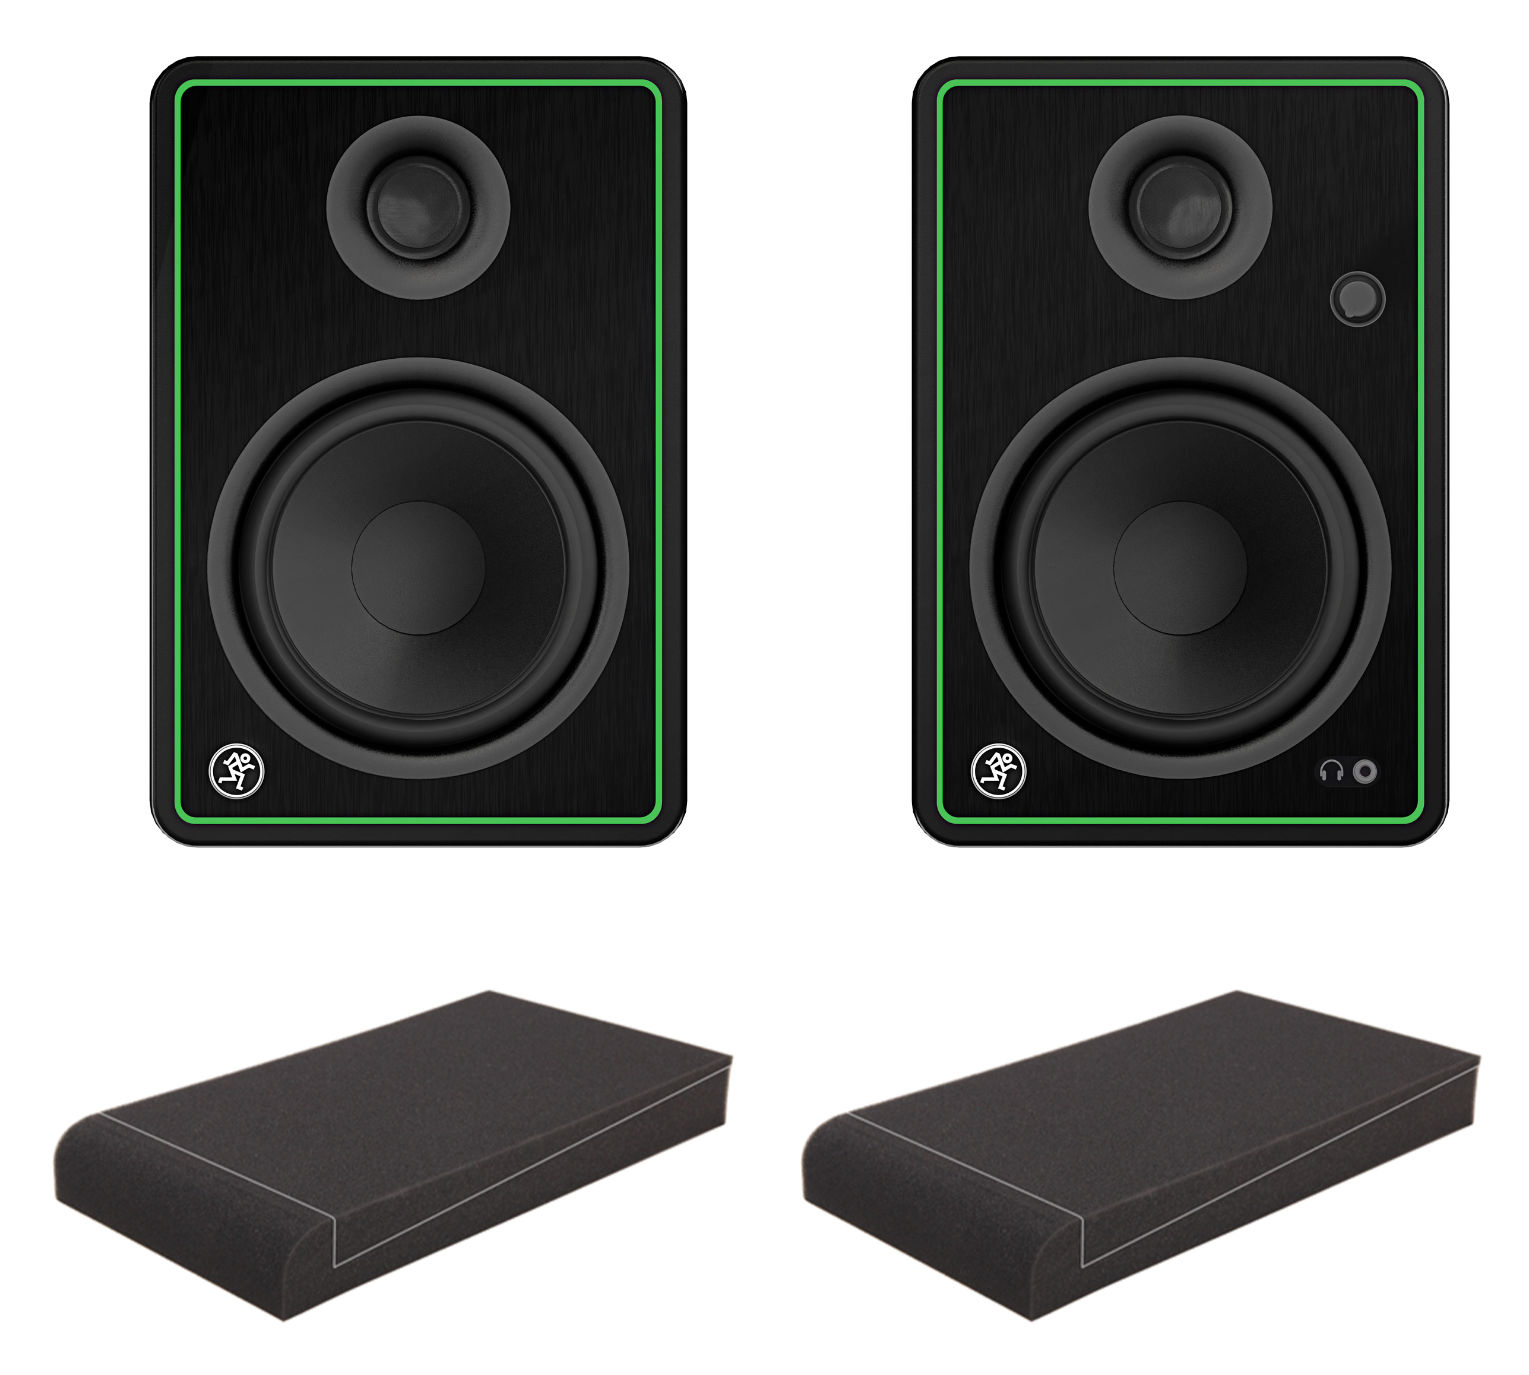 Studiomonitore - Mackie CR5 X BT ISO Set - Onlineshop Musikhaus Kirstein